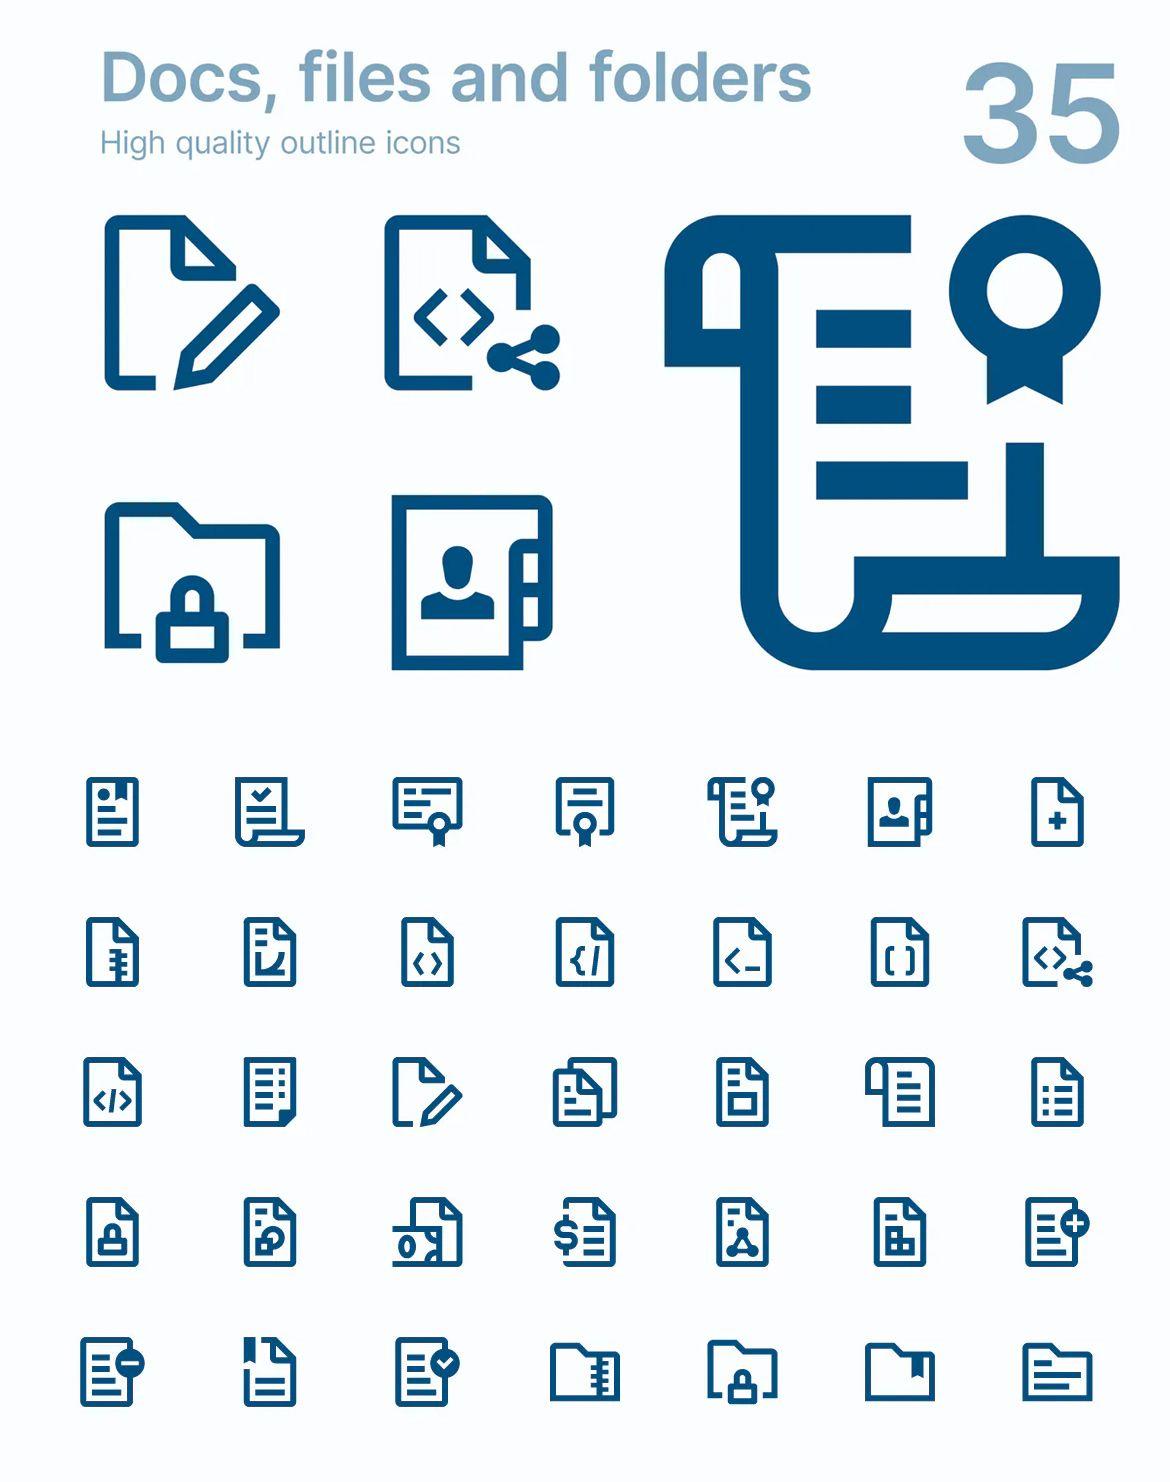 Docs, files and folders by polshindanil on Folder icon